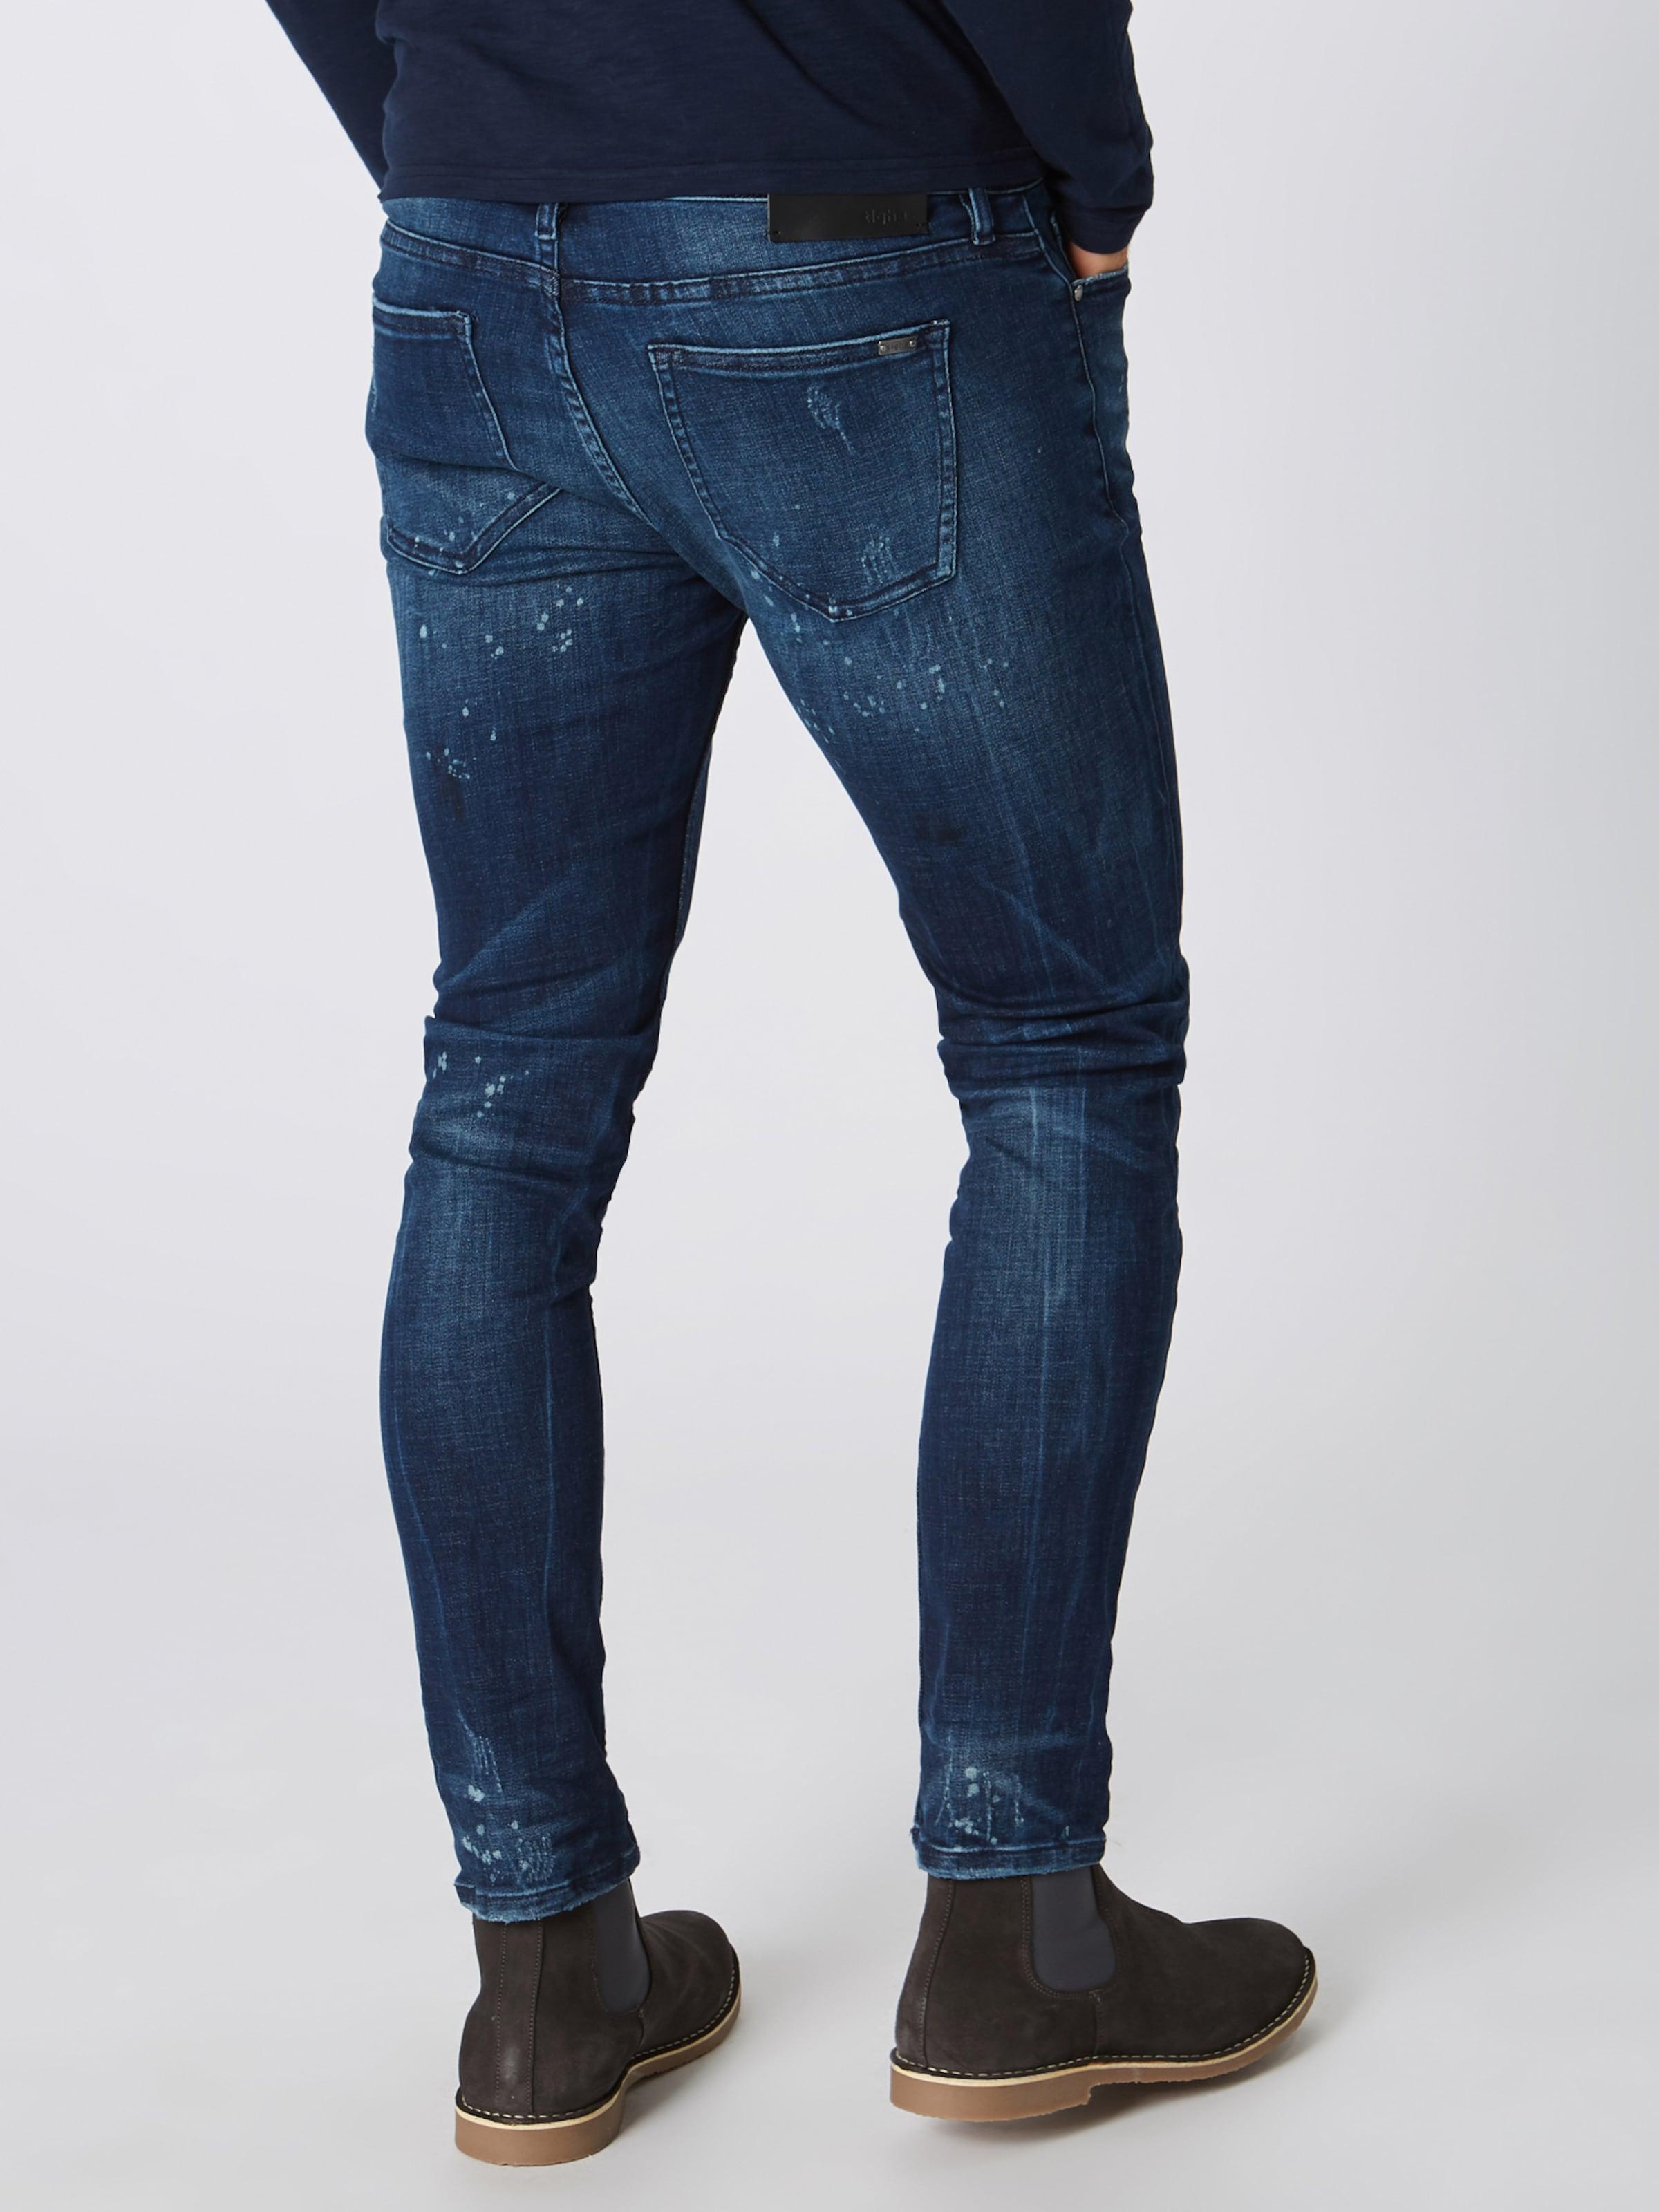 Jeans 'morty Denim In 9012' Tigha Blue w0vnymN8O